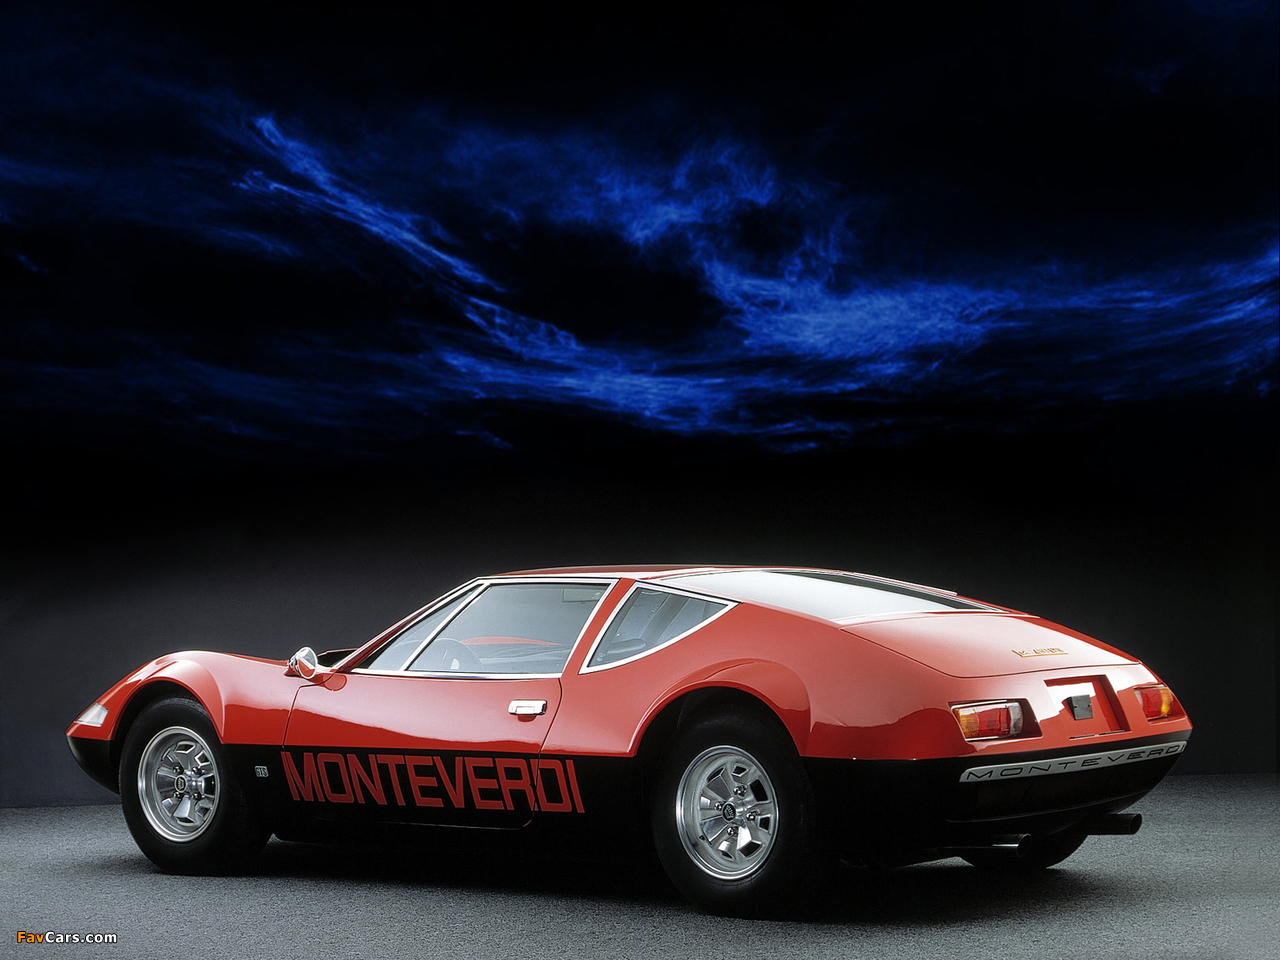 Monteverdi Hai 450 GTS 1973 photos (1280 x 960)